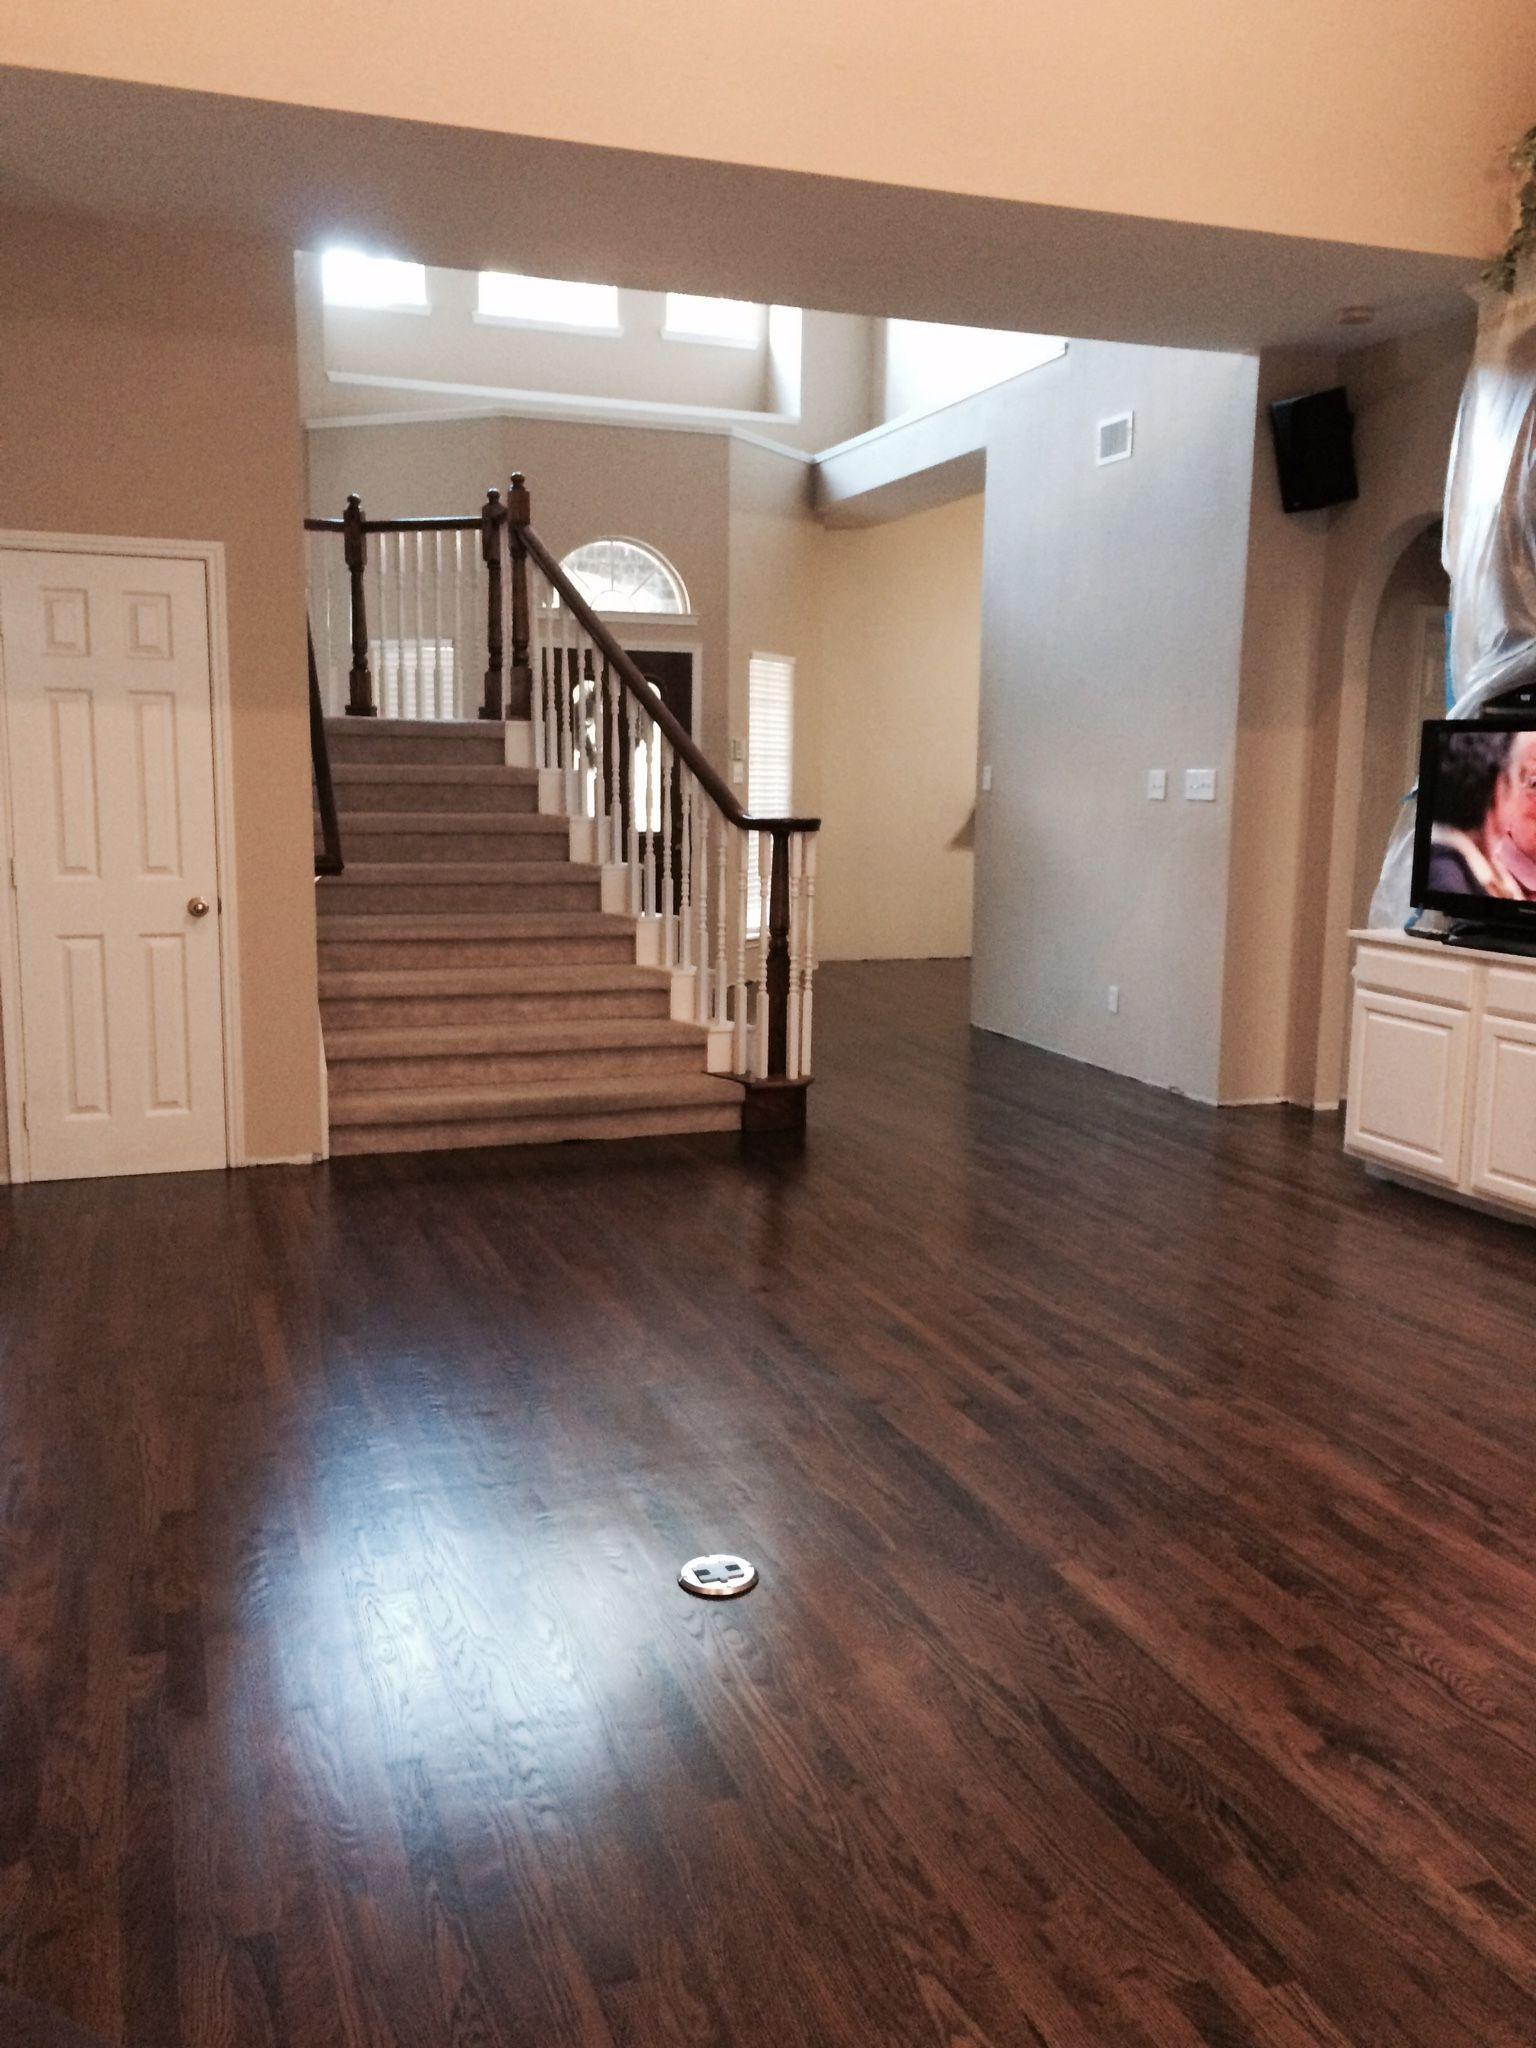 dark hardwood laminate flooring of dark walnut stain on white oak hardwood remodel 1floors in 2018 pertaining to dark walnut stain on white oak hardwood walnut hardwood flooring hardwood floor stain colors